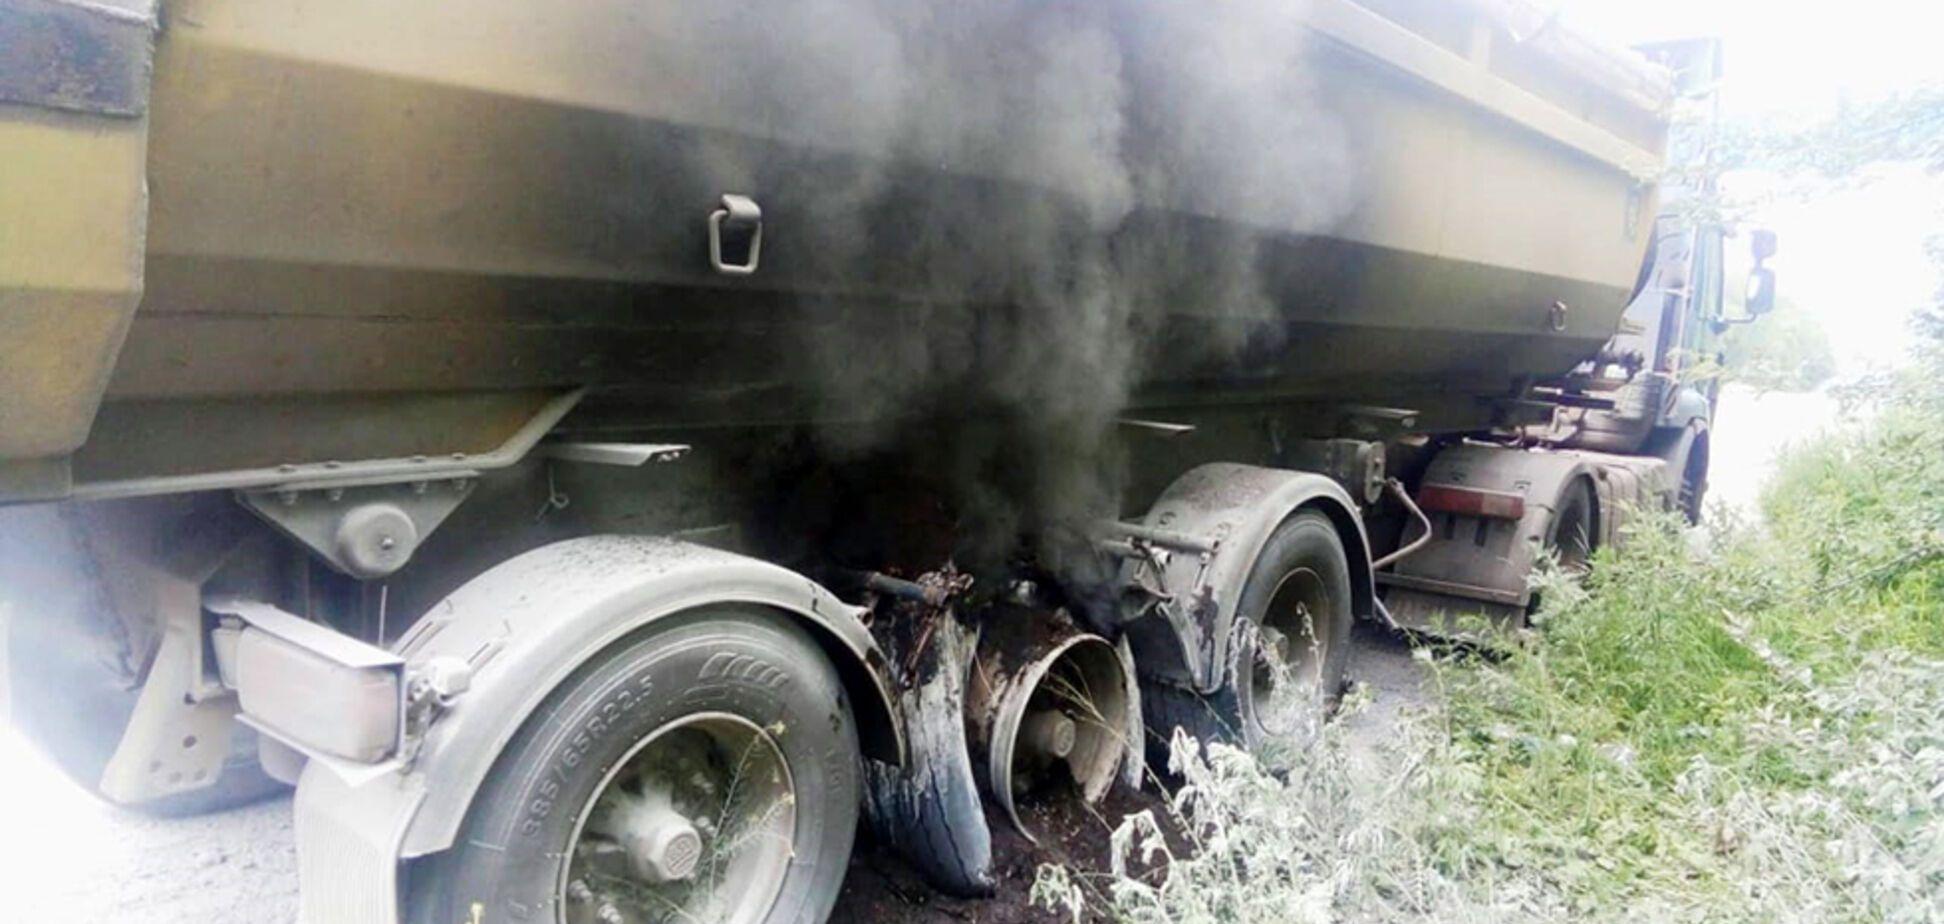 На трассе под Днепром загорелся грузовик. Фото, видео с места ЧП